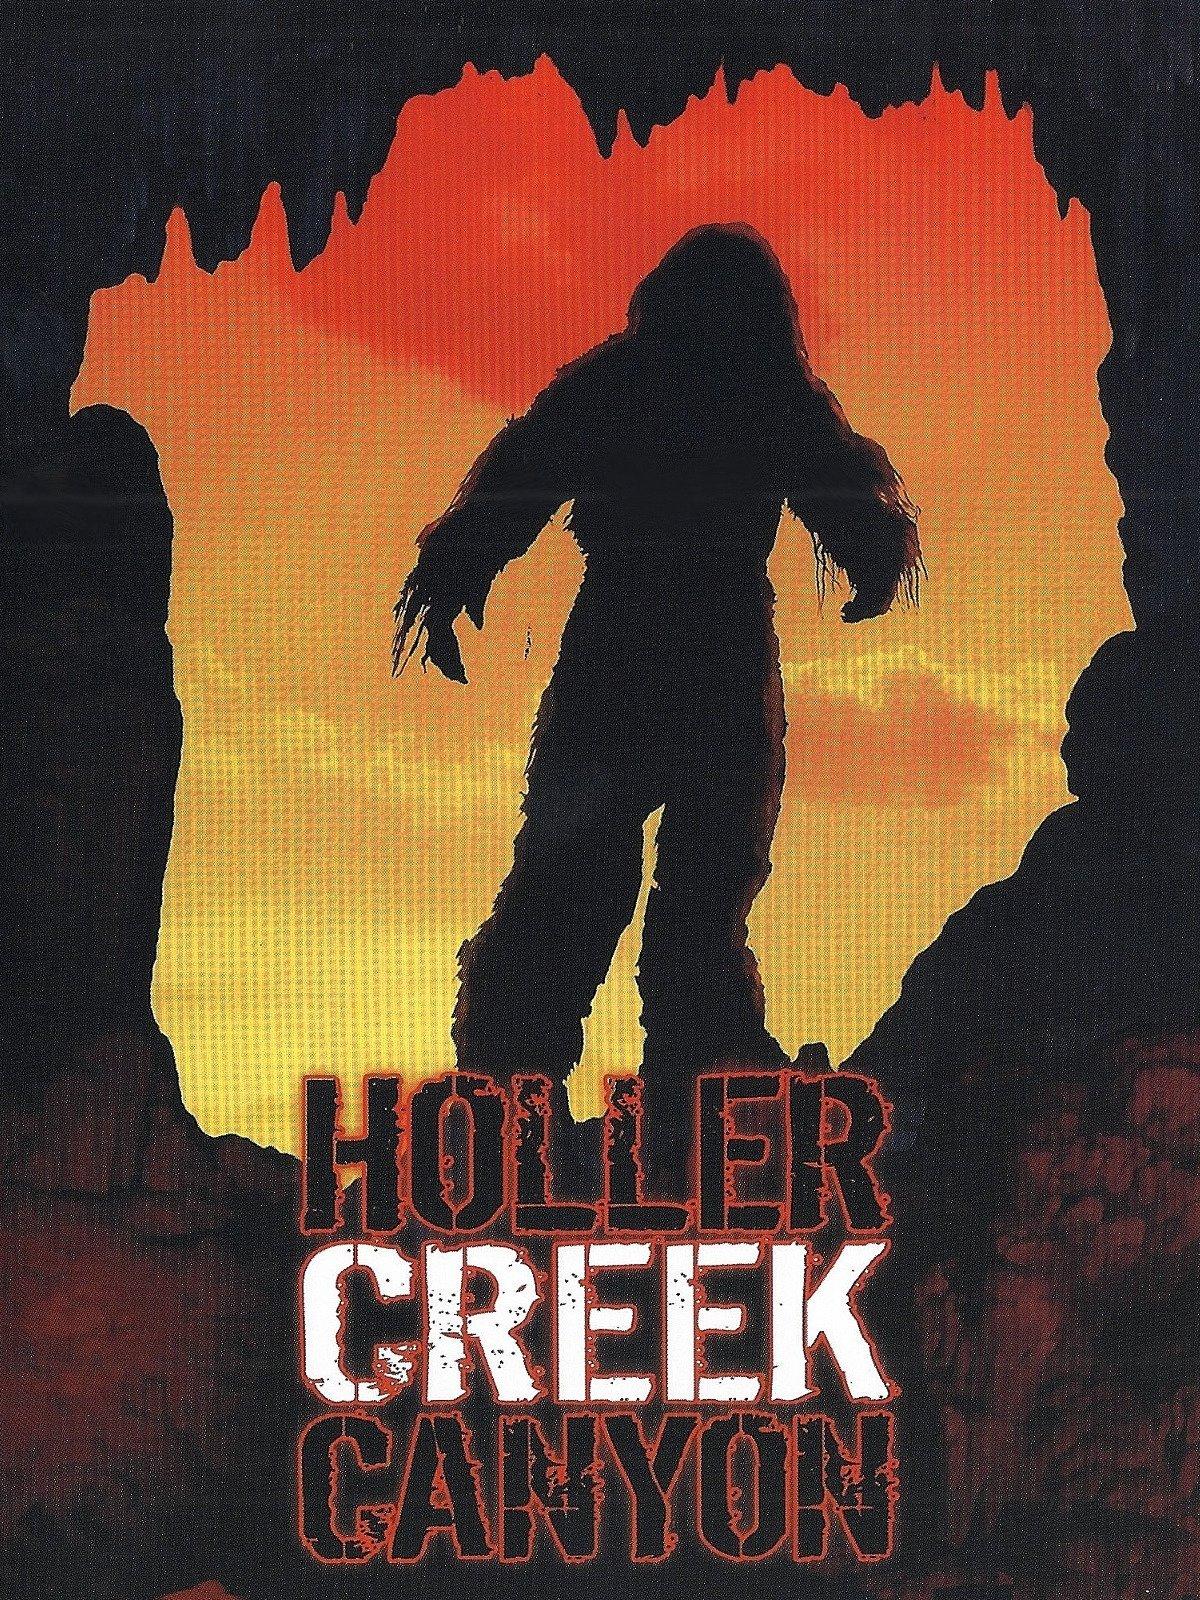 Holler Creek Canyon